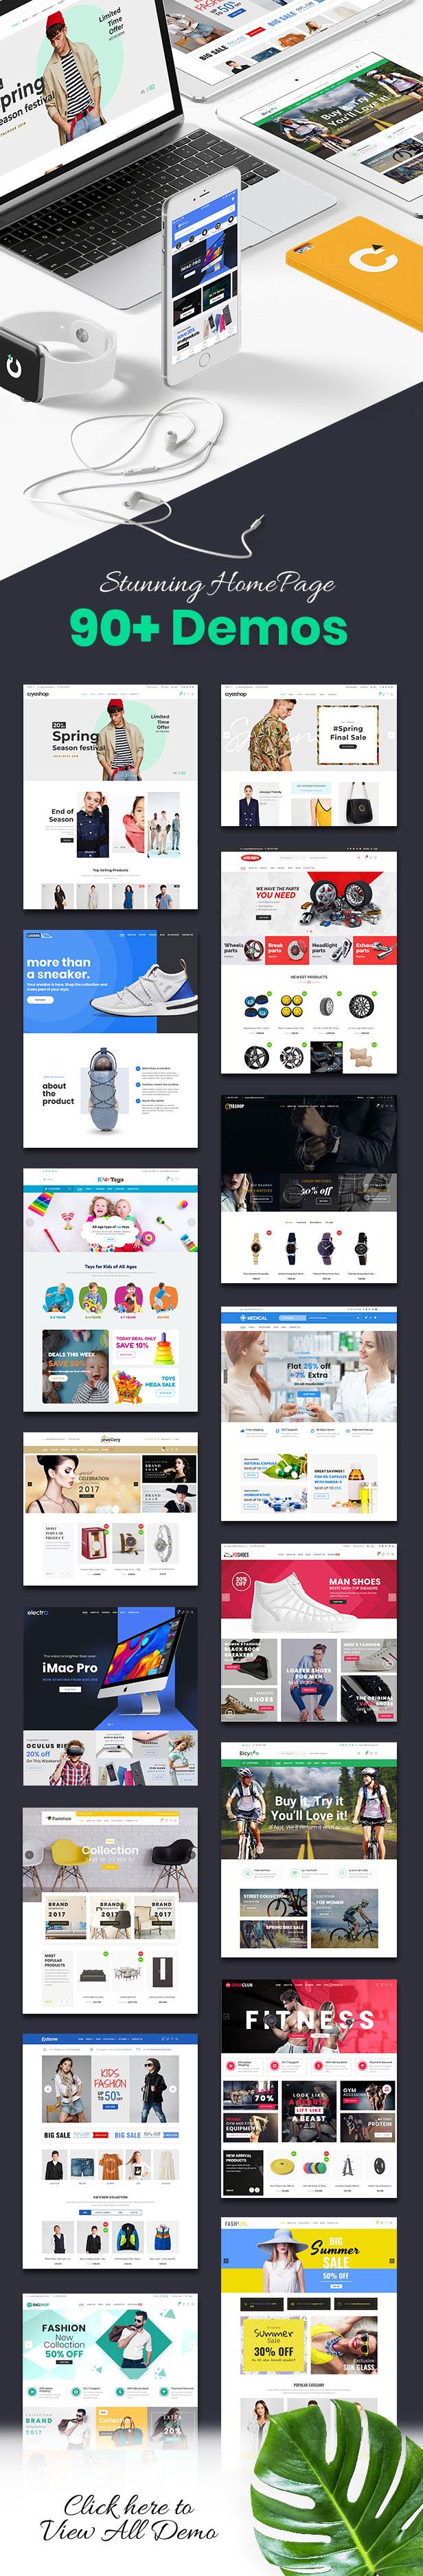 home demo welcome - CiyaShop - Responsive Multi-Purpose WooCommerce WordPress Theme